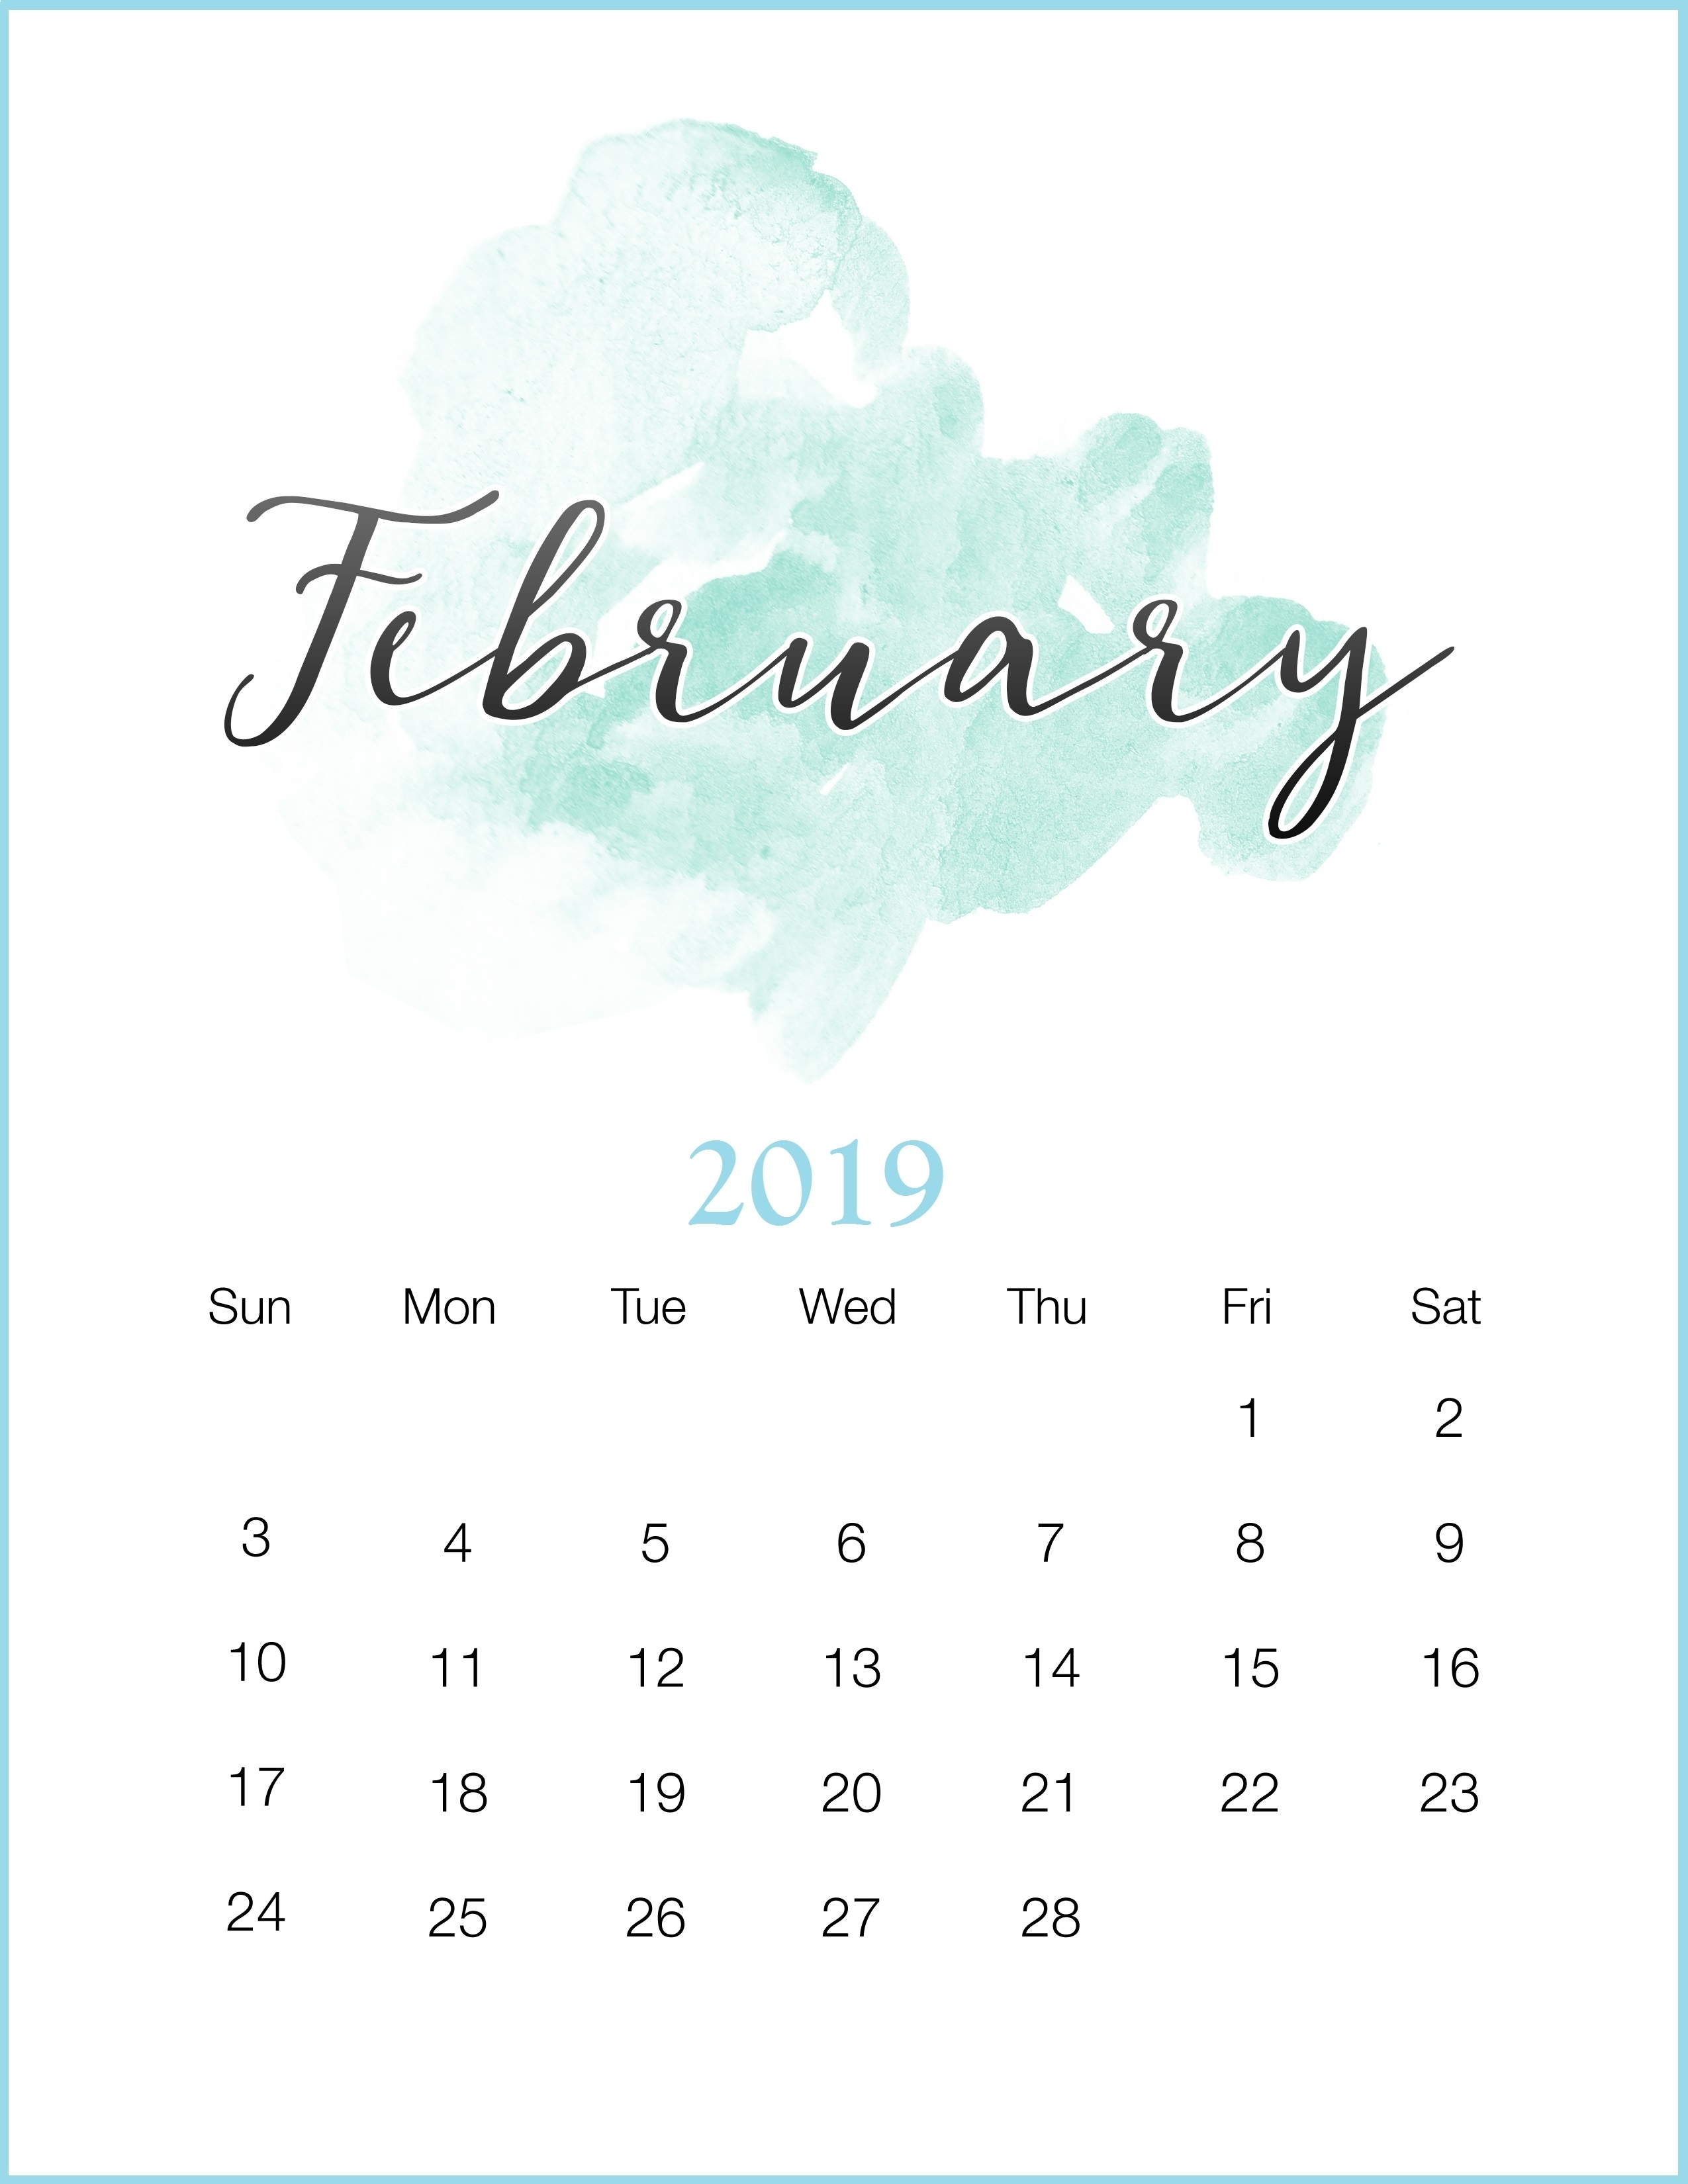 february 2019 template printable::February 2019 Calendar